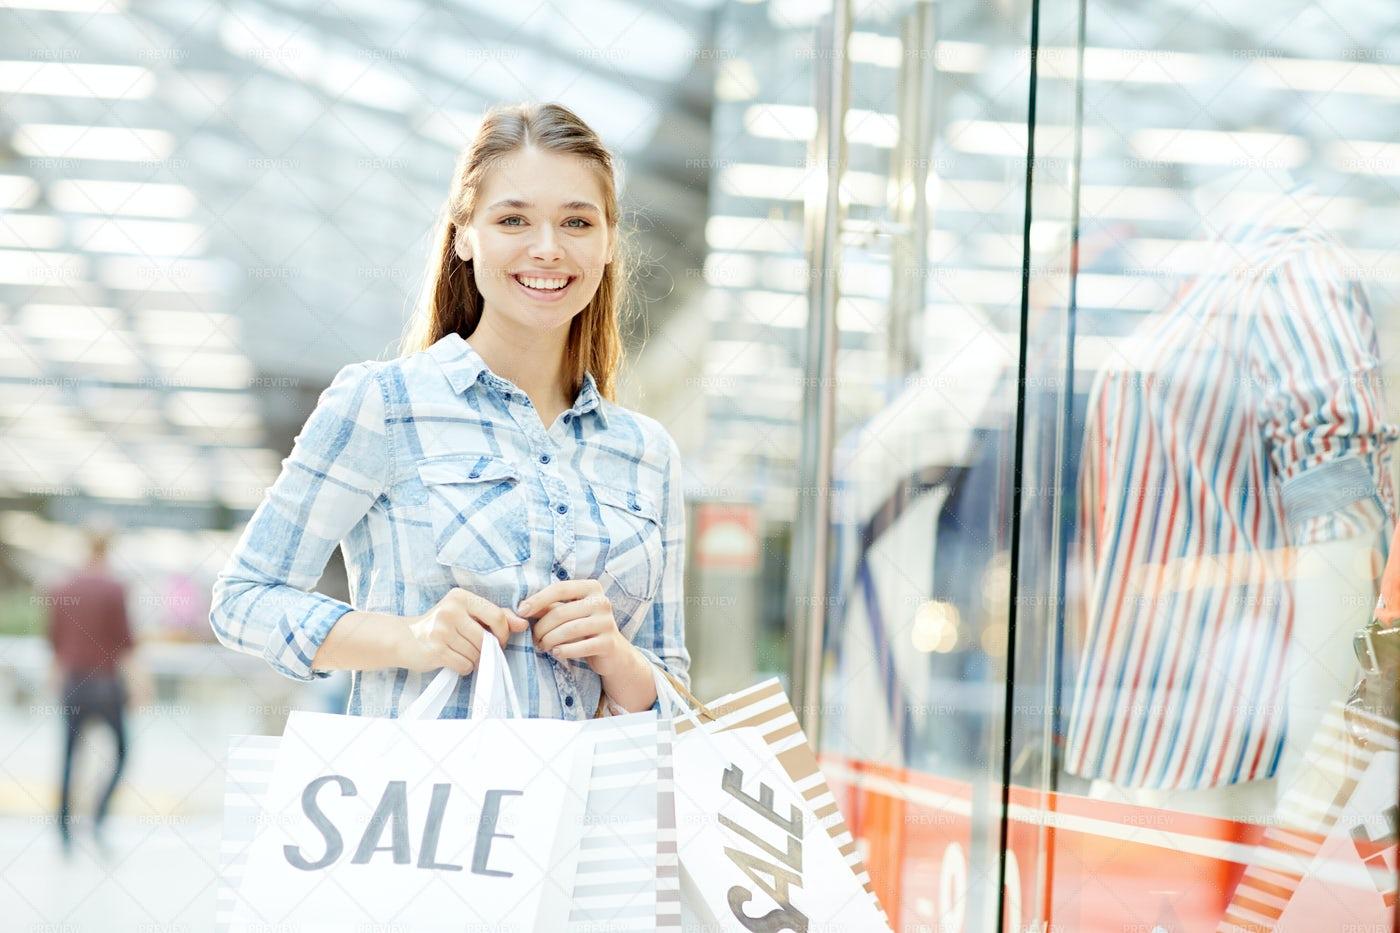 Young Shopaholic: Stock Photos